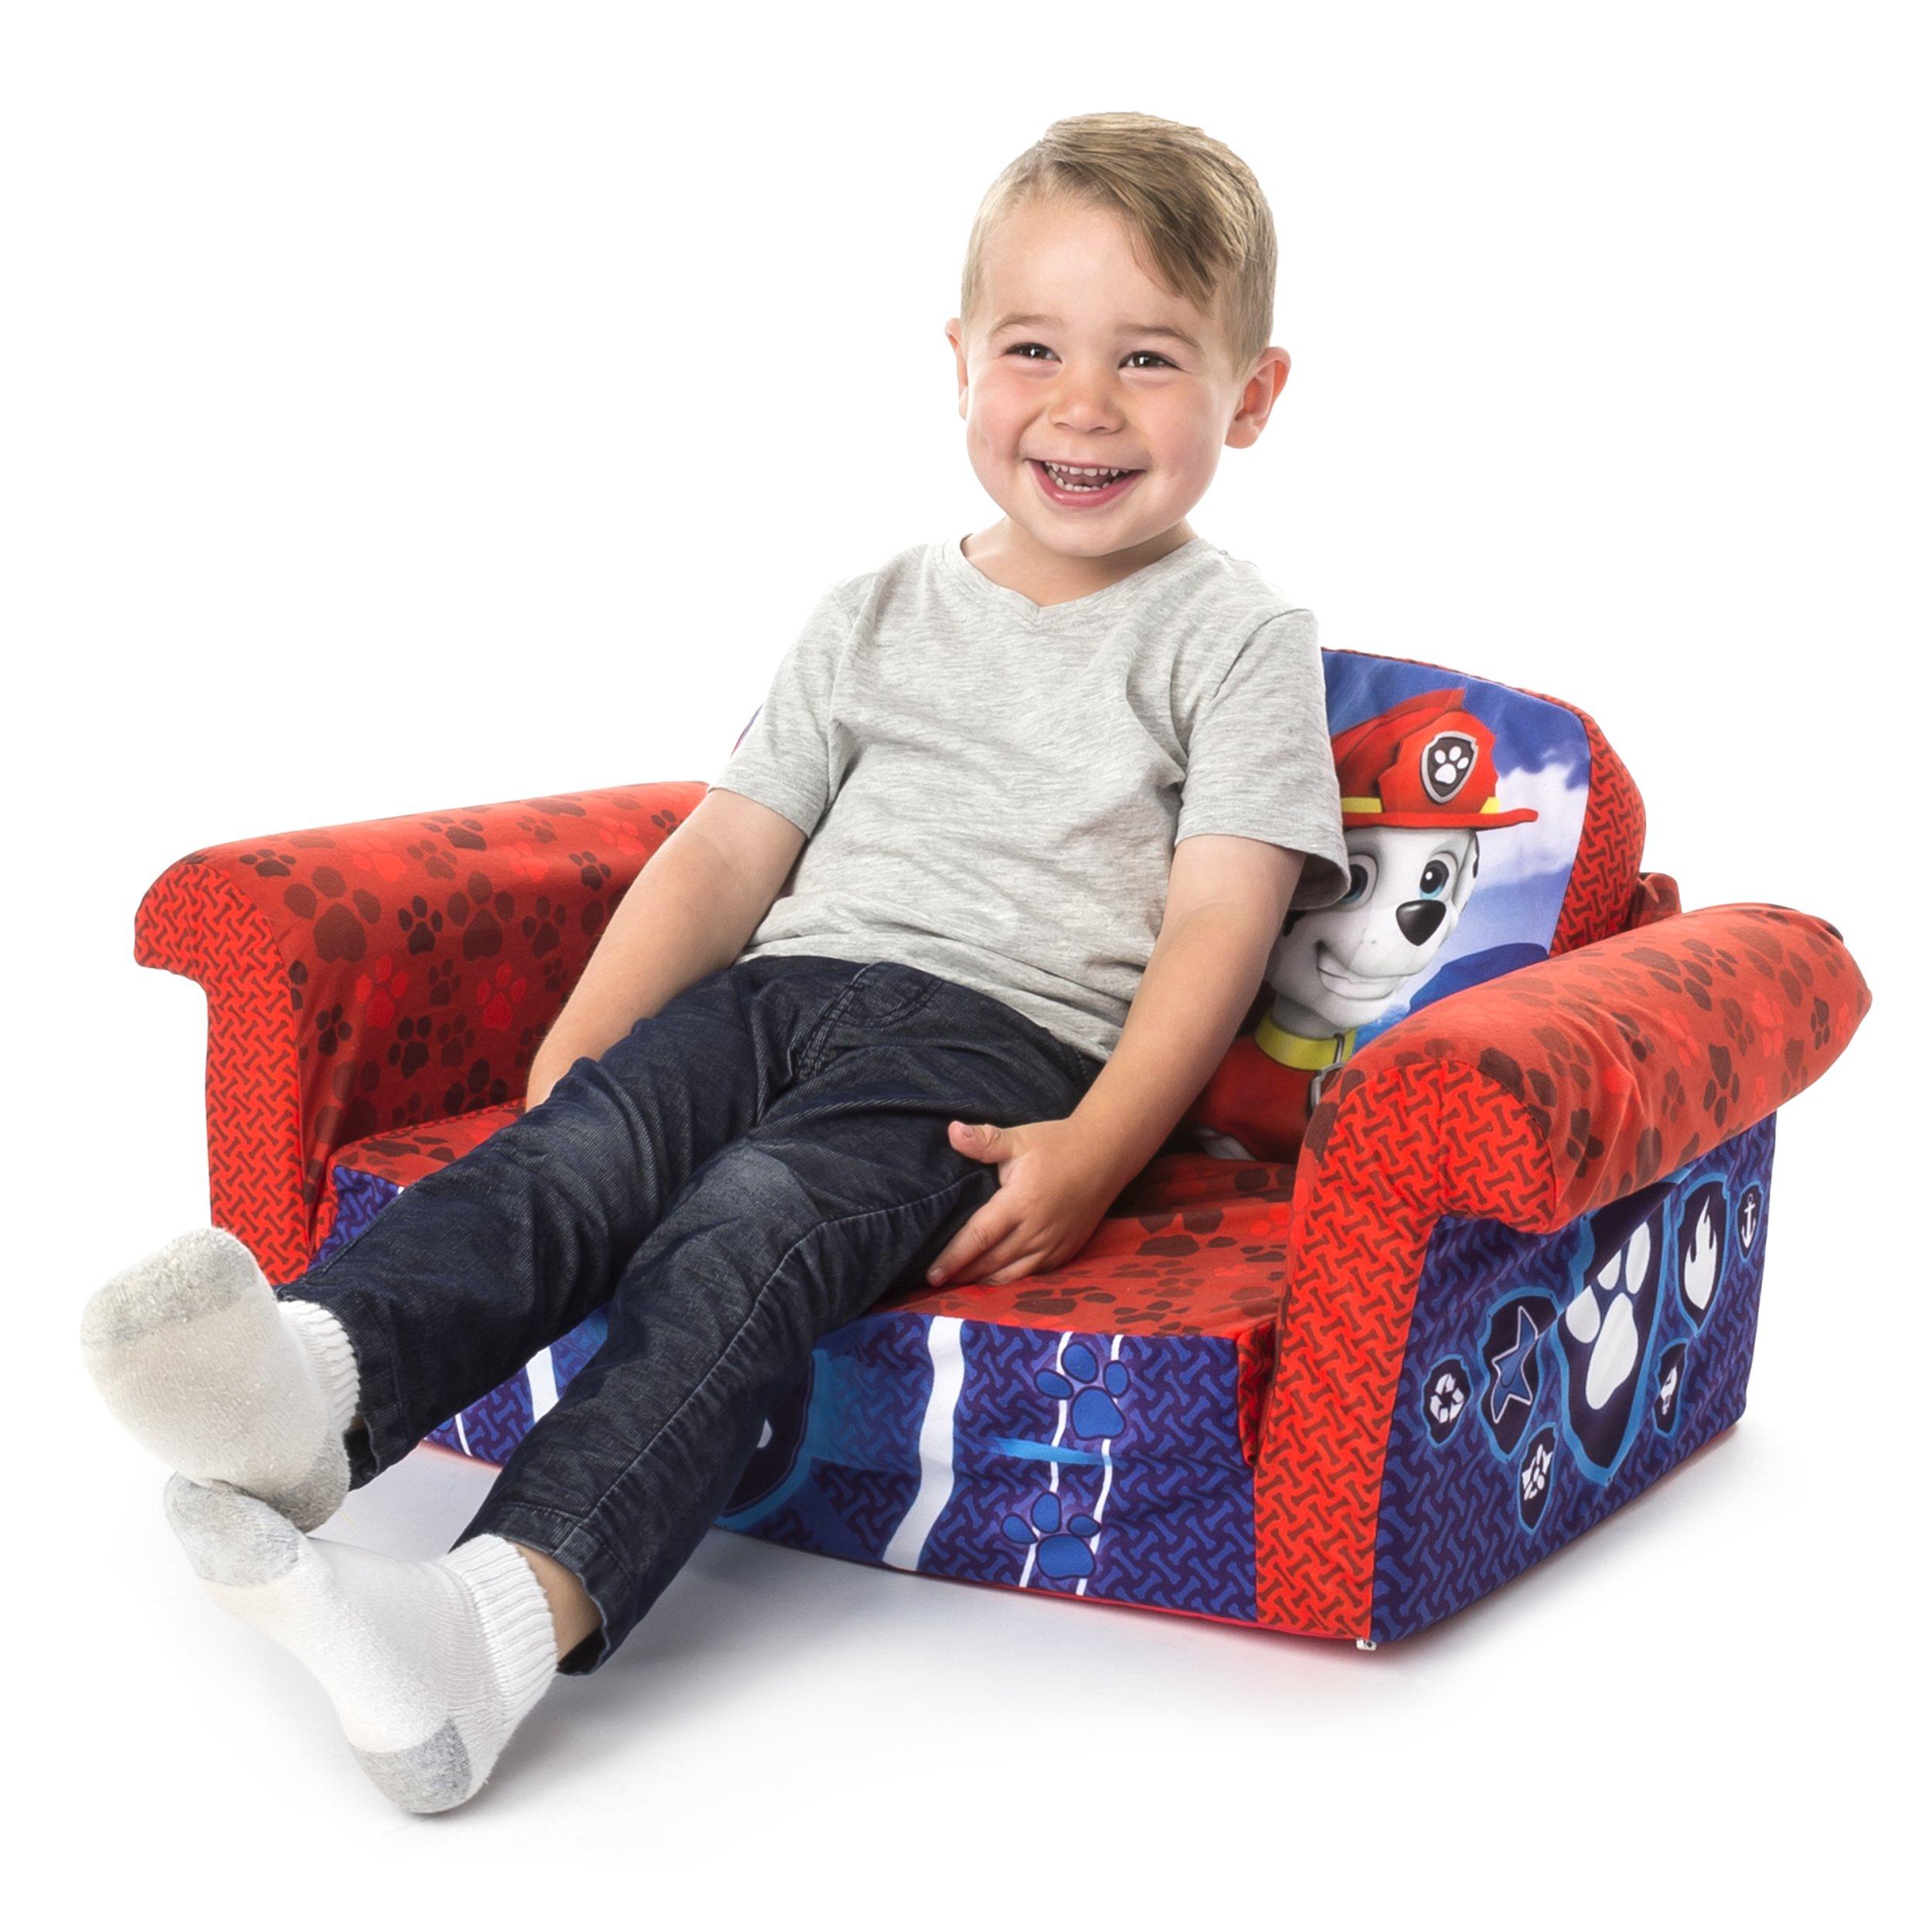 Marshmallow Furniture Children's 2 in 1 Flip Open Foam, Nickelodeon Paw Patrol Sofa Chair Furniture, Red by Marshmallow Furniture (Image #4)